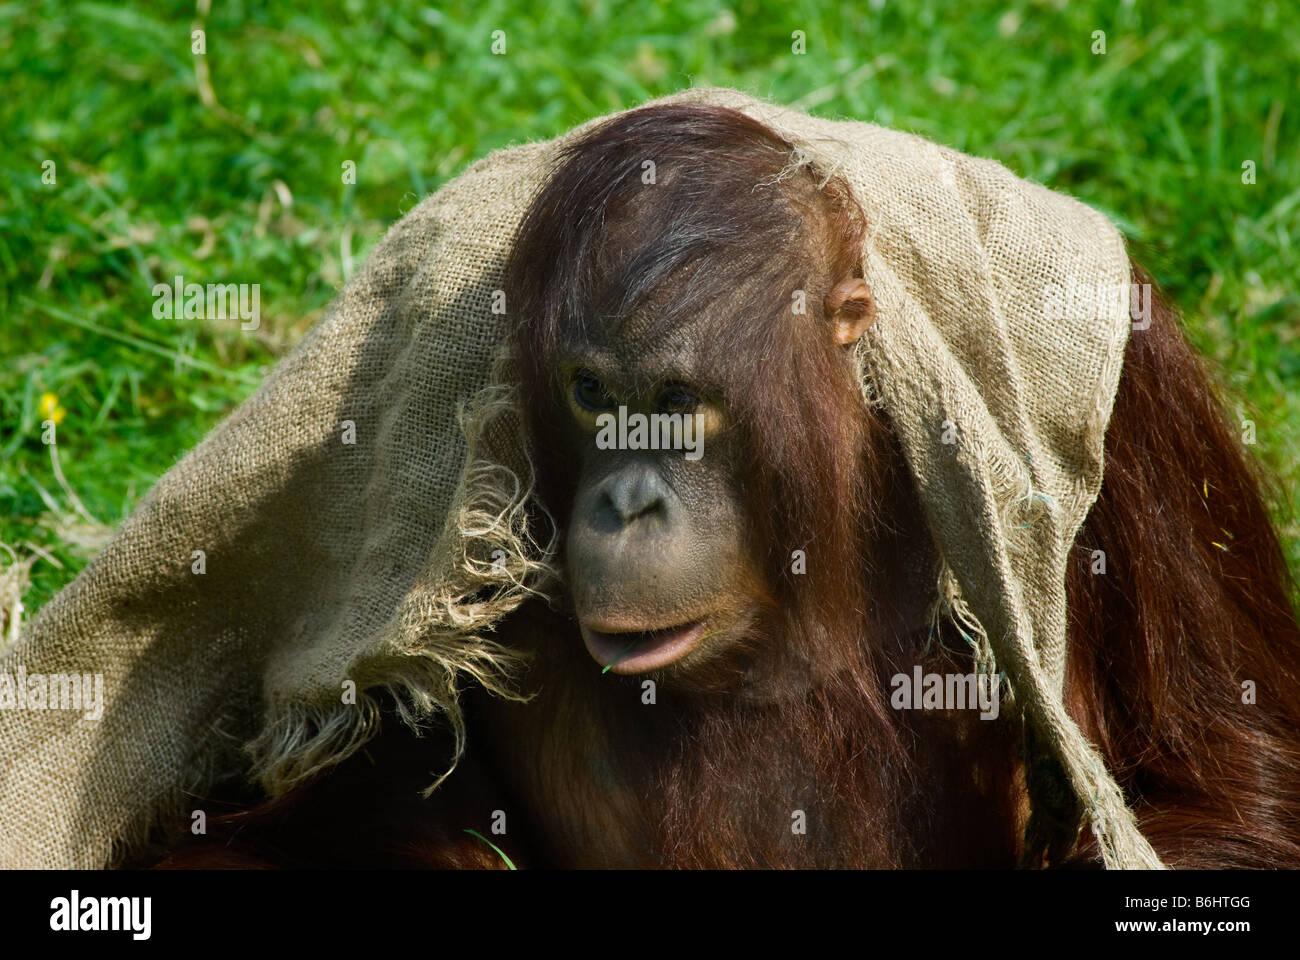 cute baby orangutan playing on the grass Stock Photo